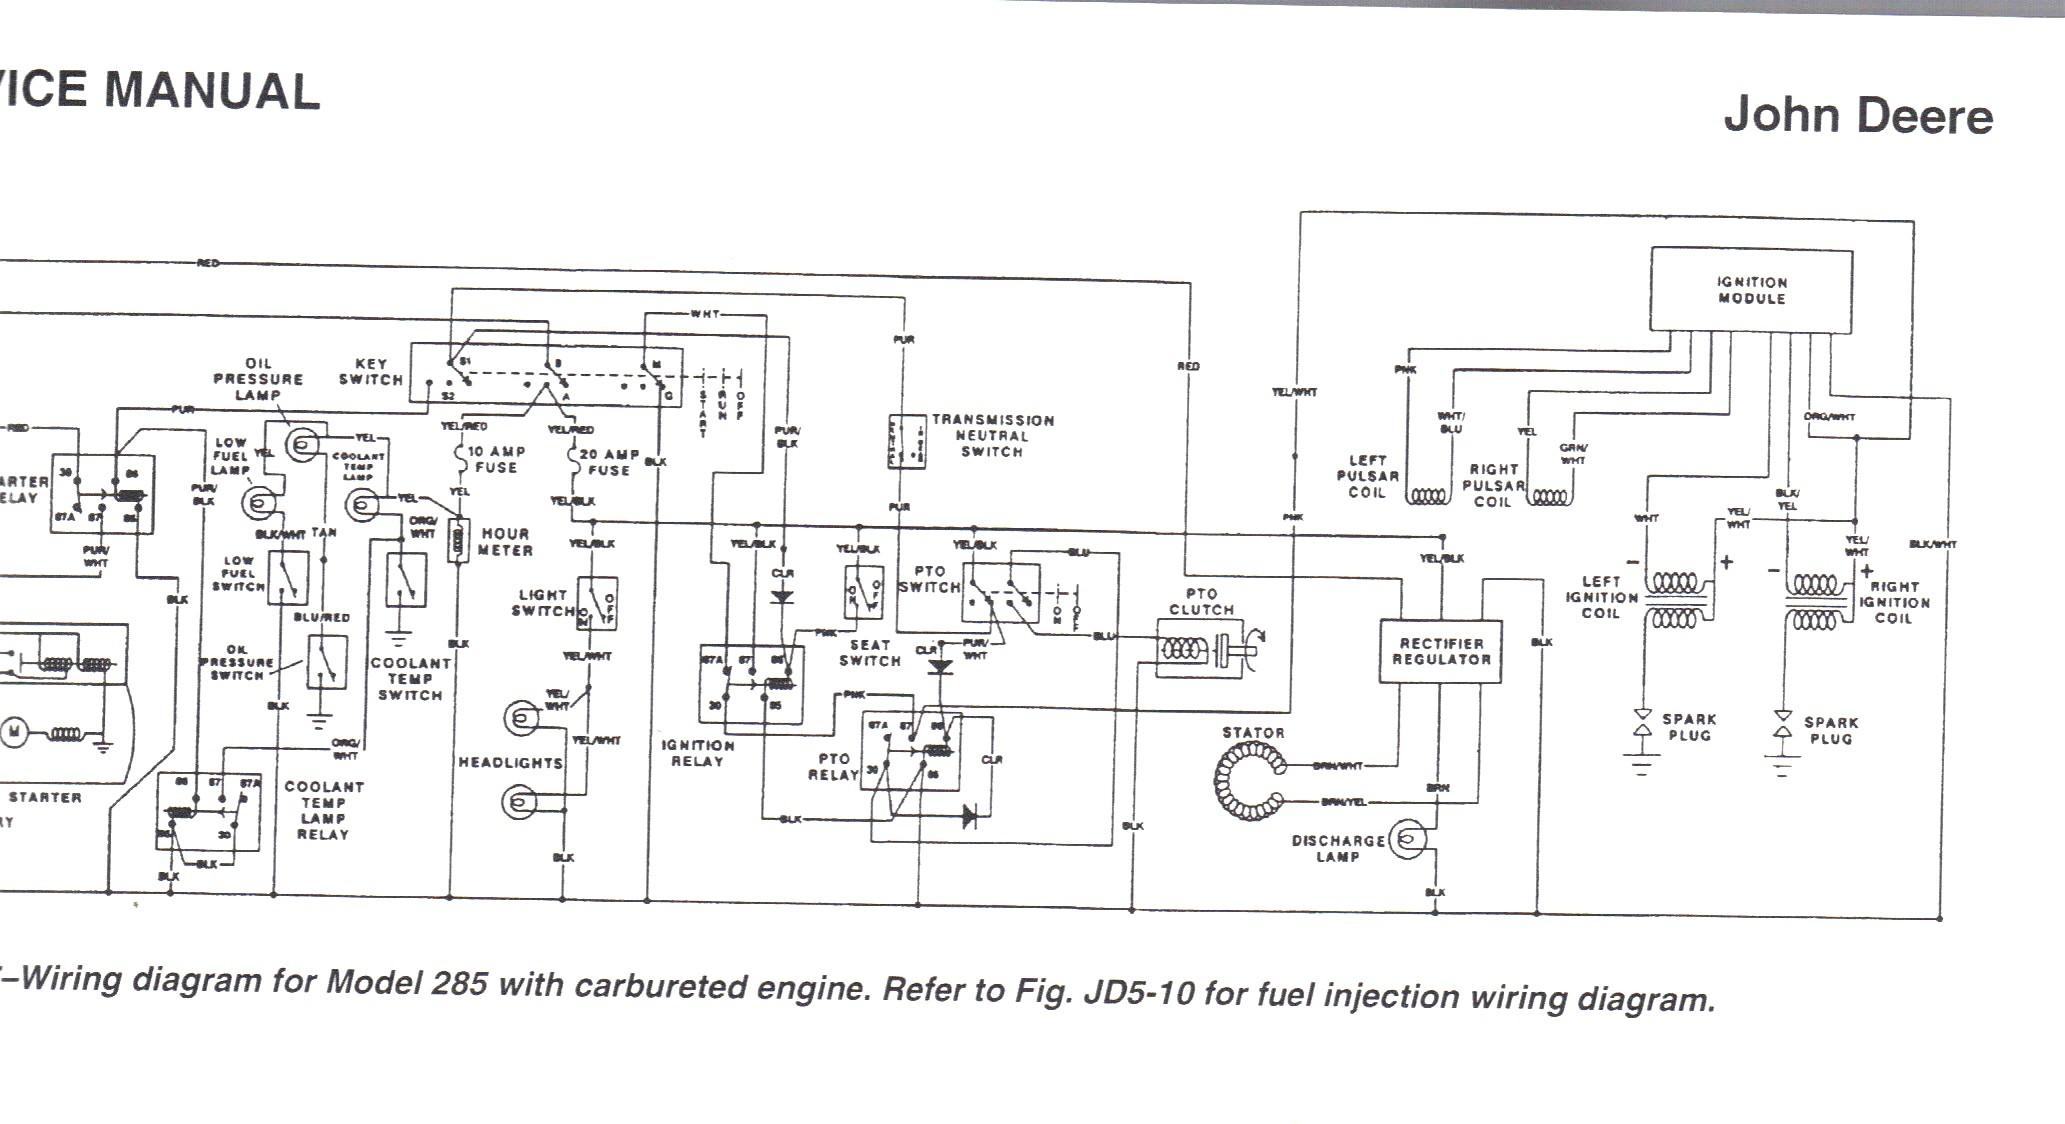 John Deere La105 Engine Diagram John Deere 1435 Electrical Diagram Wiring Throughout 1445 Hbphelp Of John Deere La105 Engine Diagram